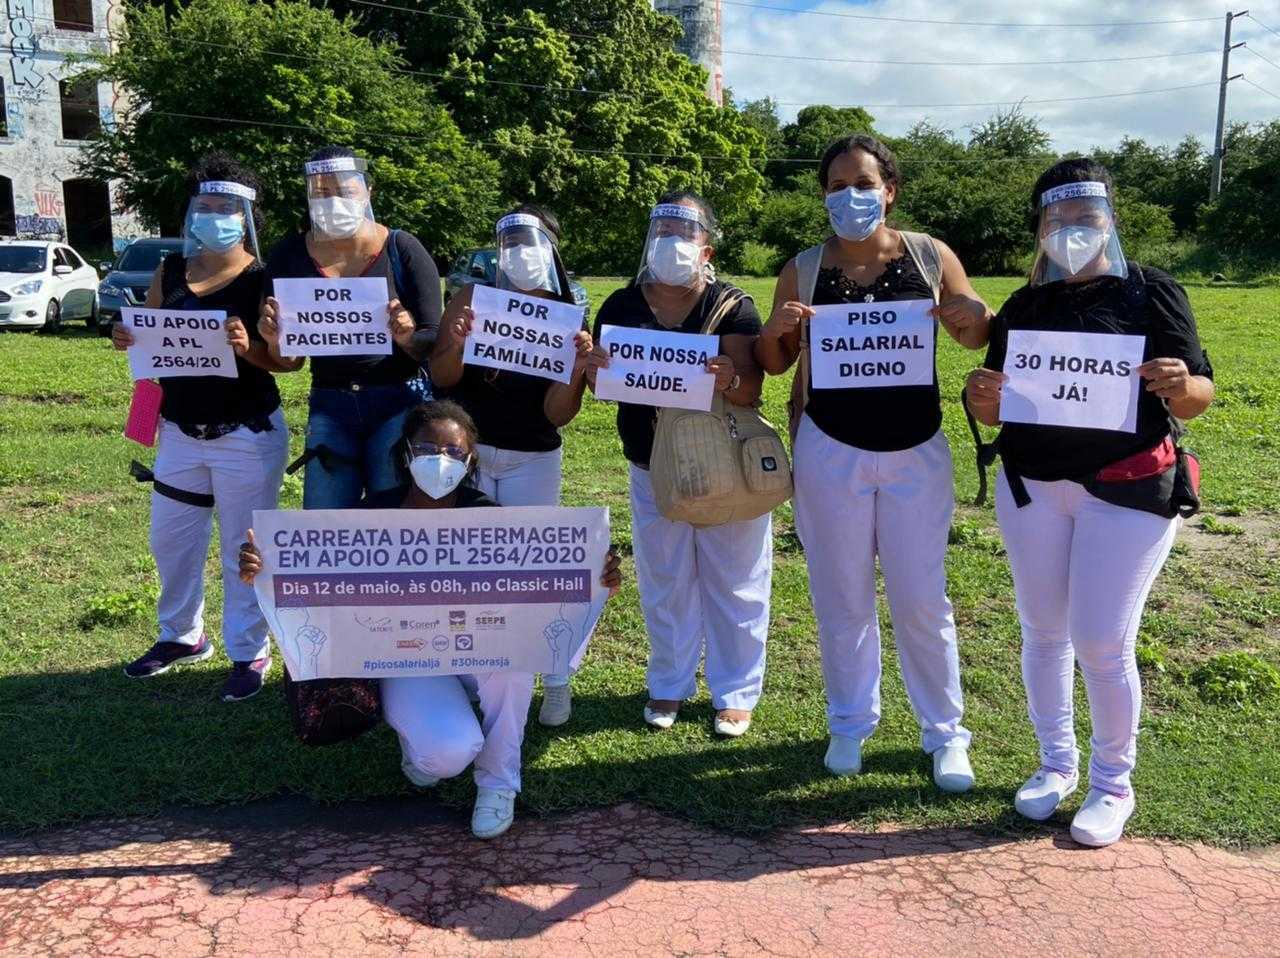 Protesto de enfermeiros no Recife